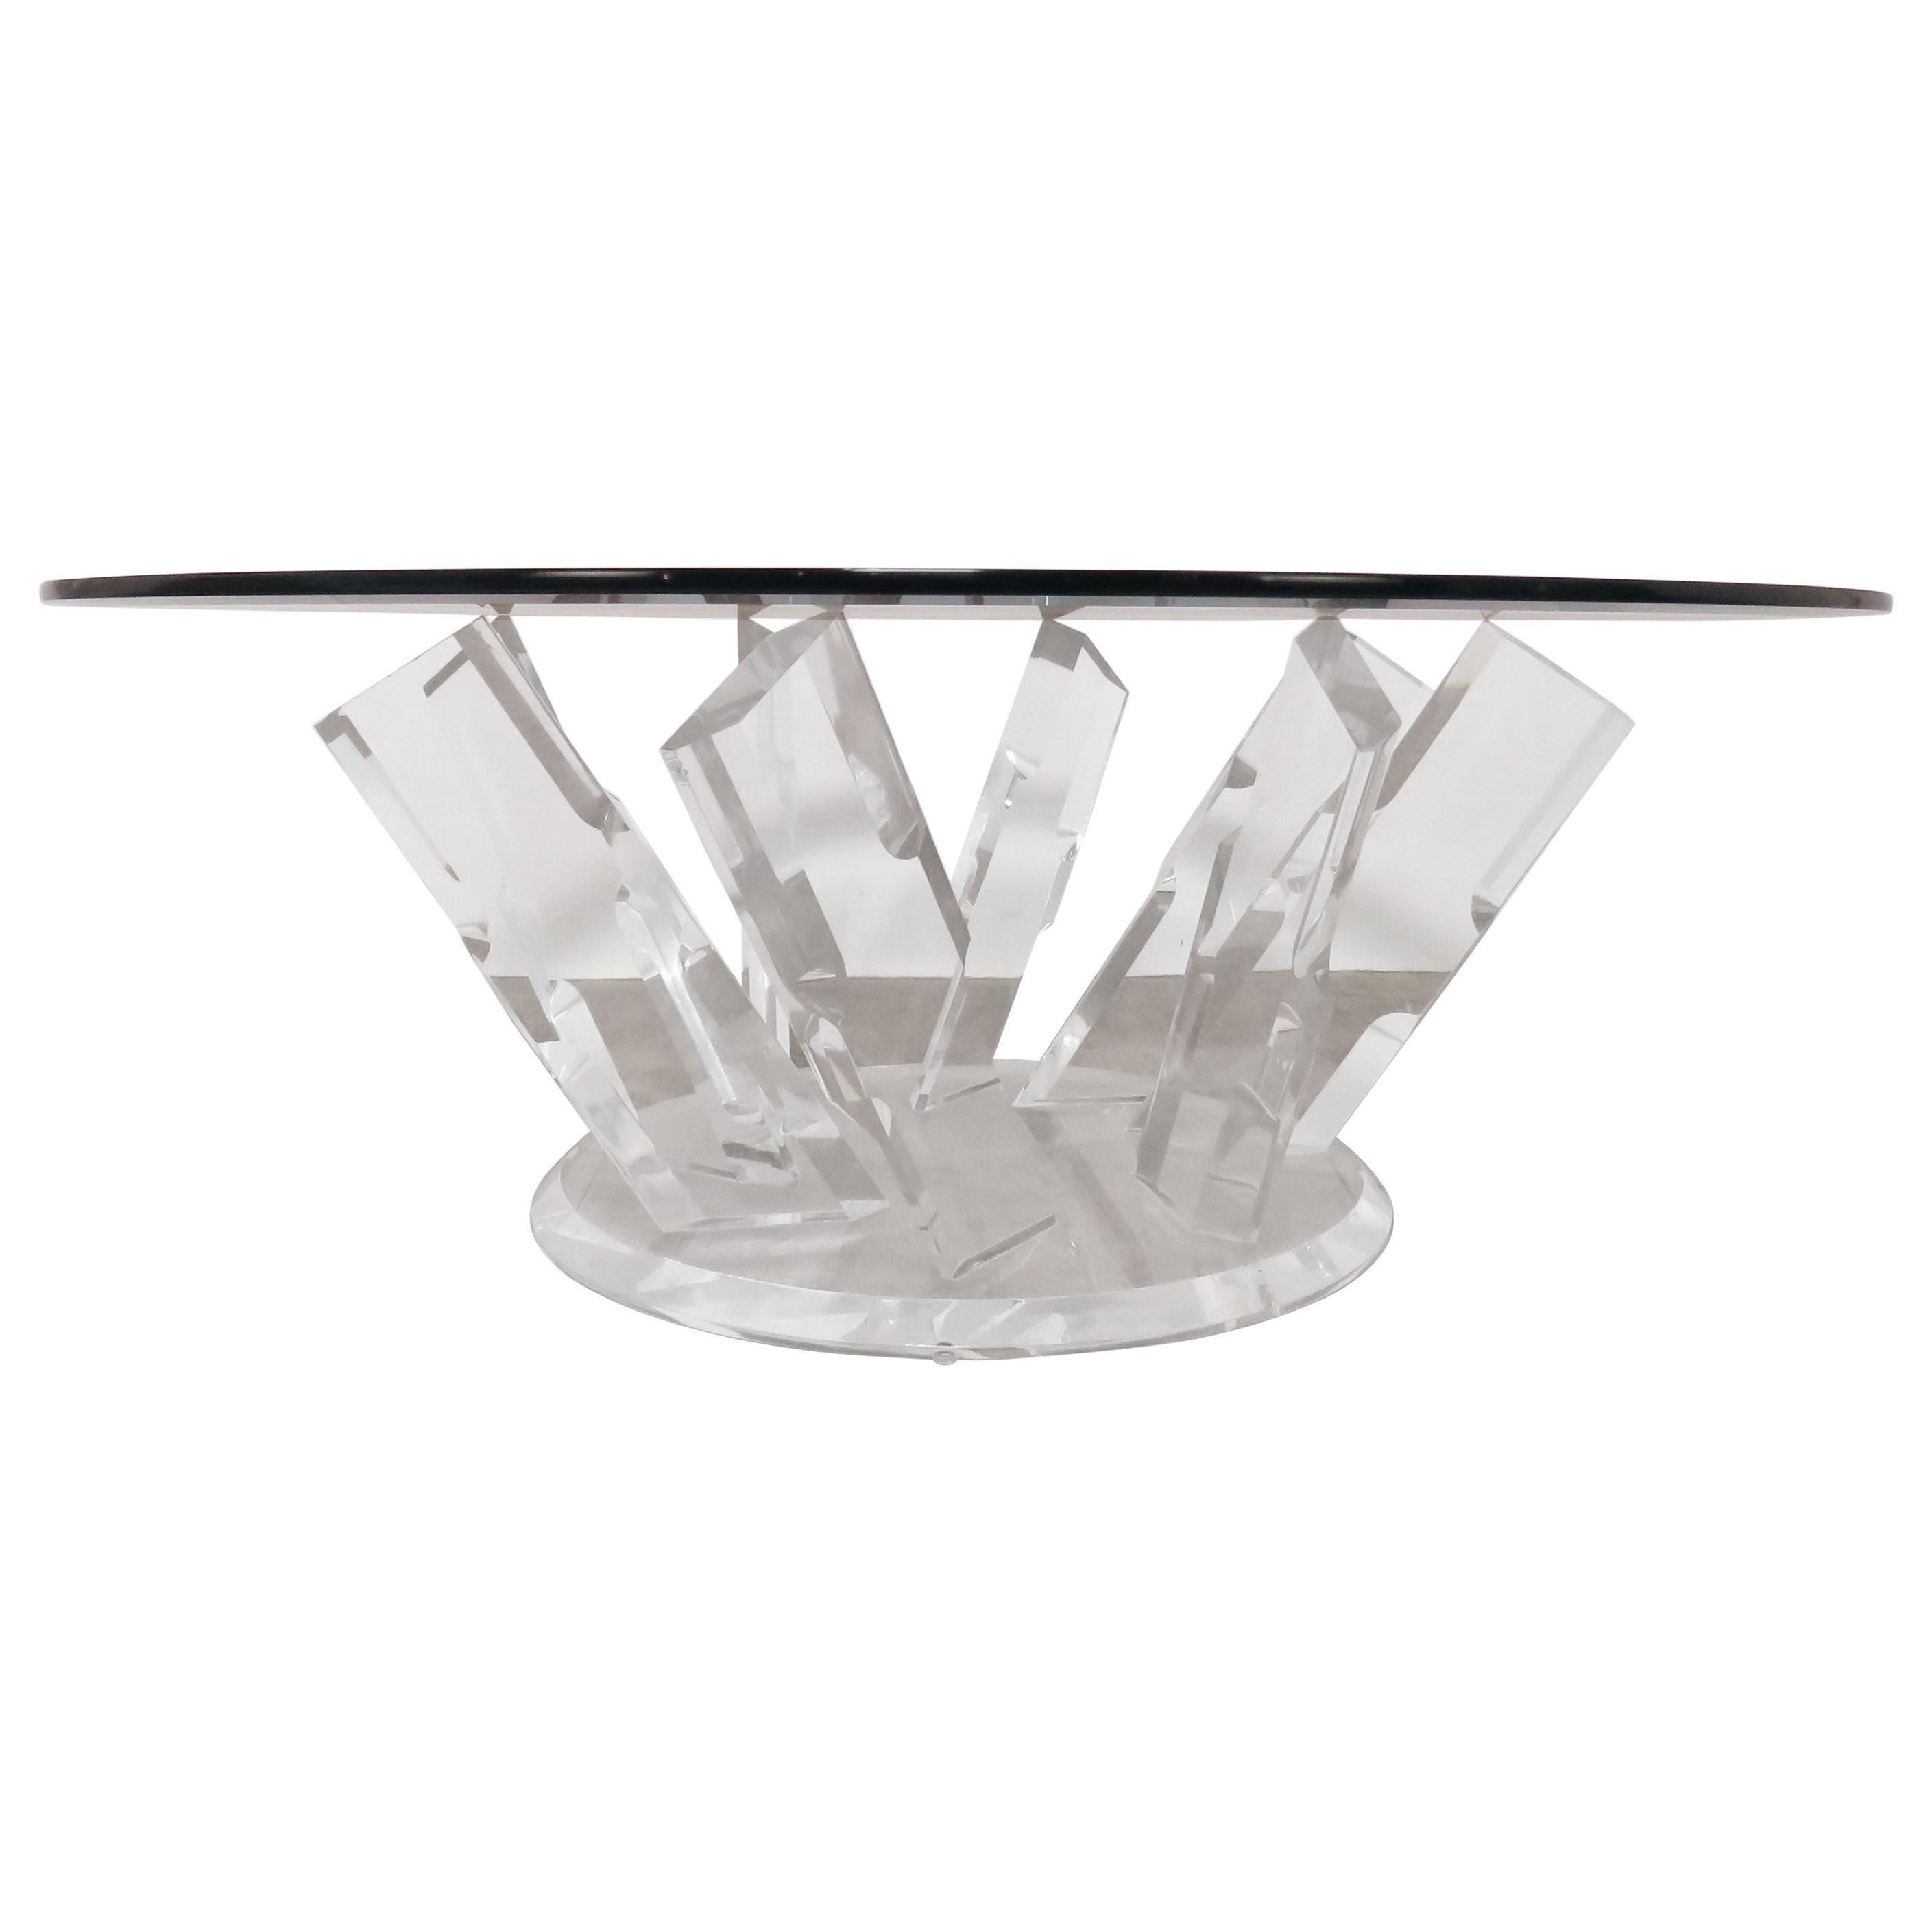 Lucite Pinwheel Form Coffee Table, circa 1980s